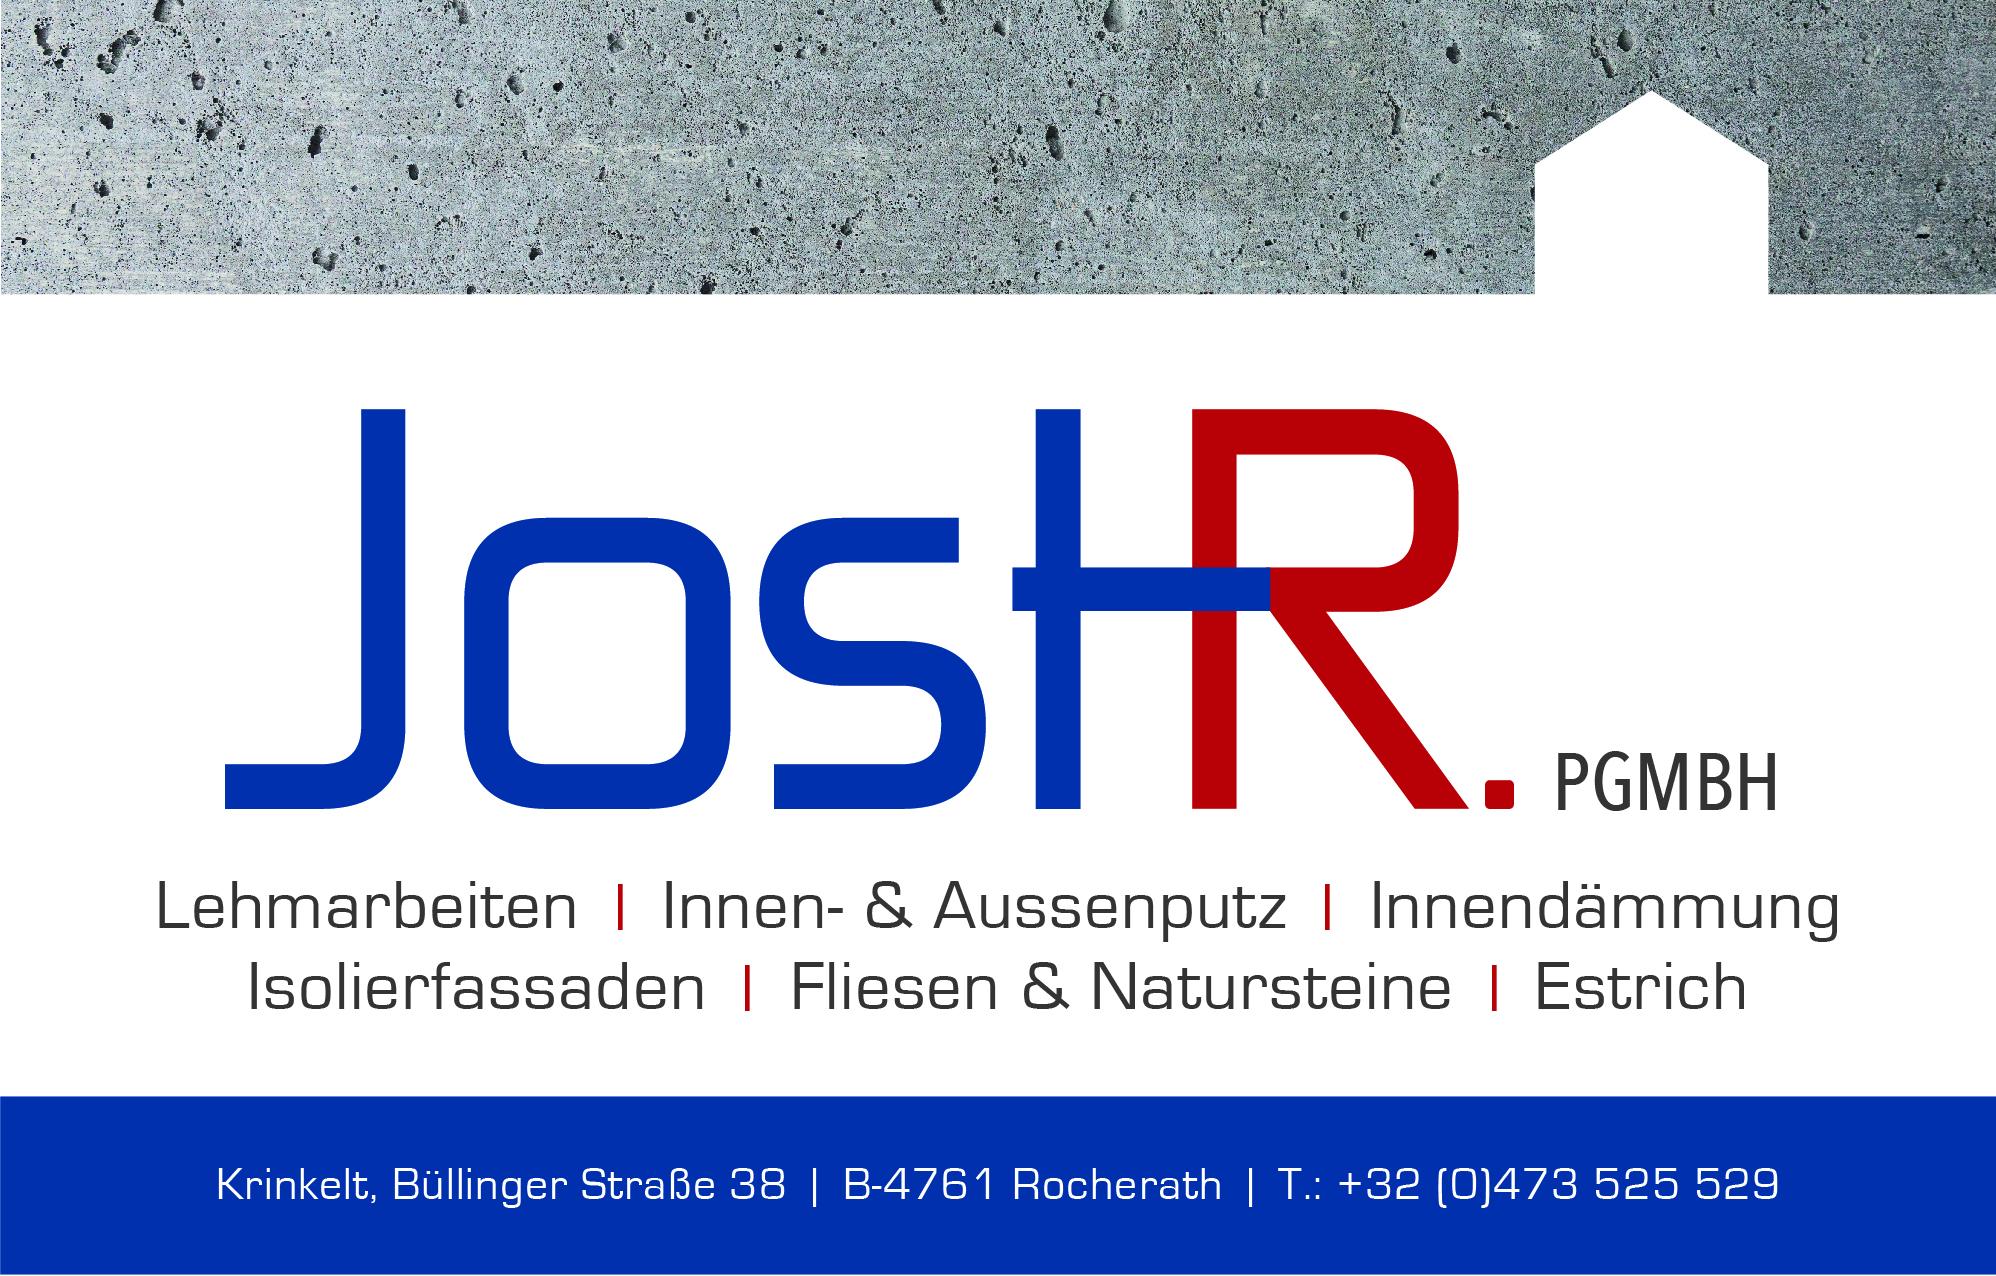 Logo Jost R. PGmbH